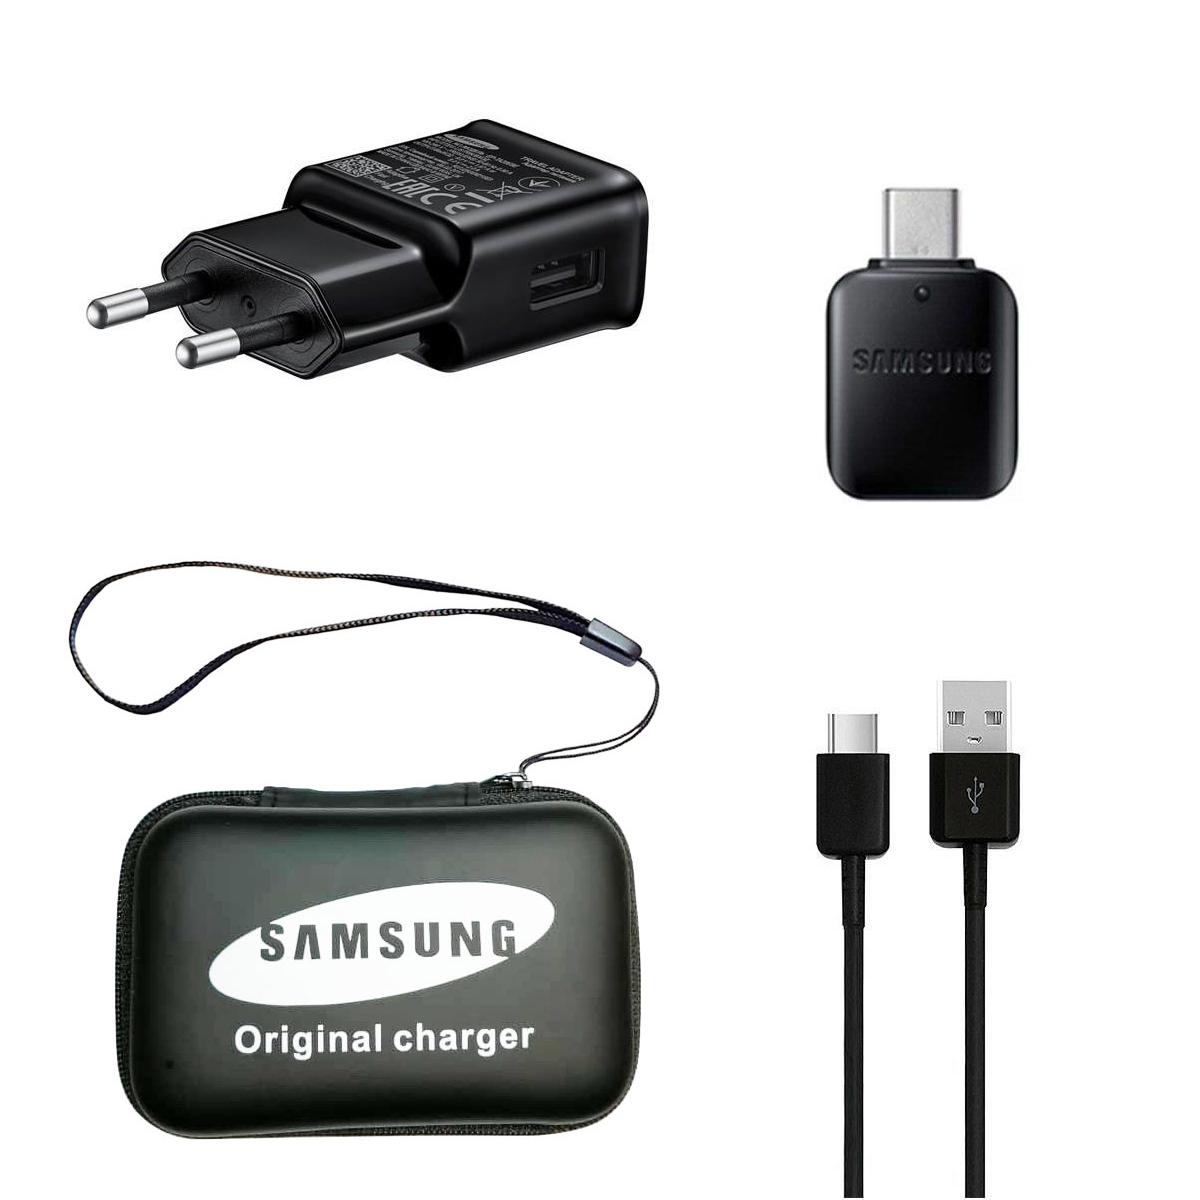 مجموعه لوازم جانبی گوشی موبایل مدل DST-1009